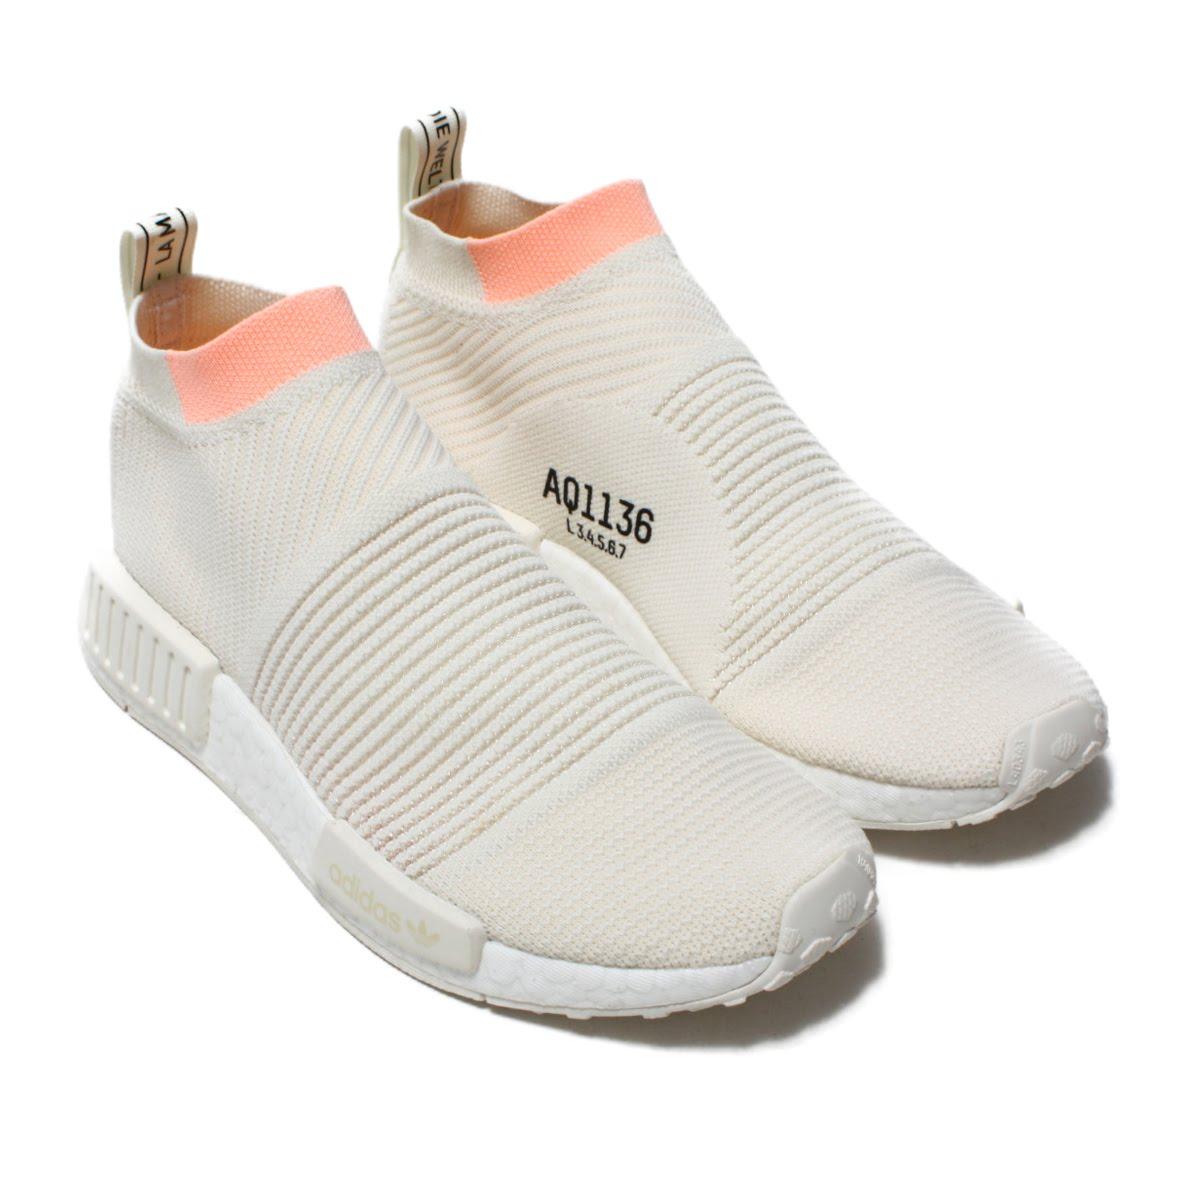 adidas Originals NMD CS1 PK W(アディダス オリジナルス エヌエムディCS1PKW)Cloud White/Cloud White/Clear Orange【メンズ レディース スニーカー】18FW-I